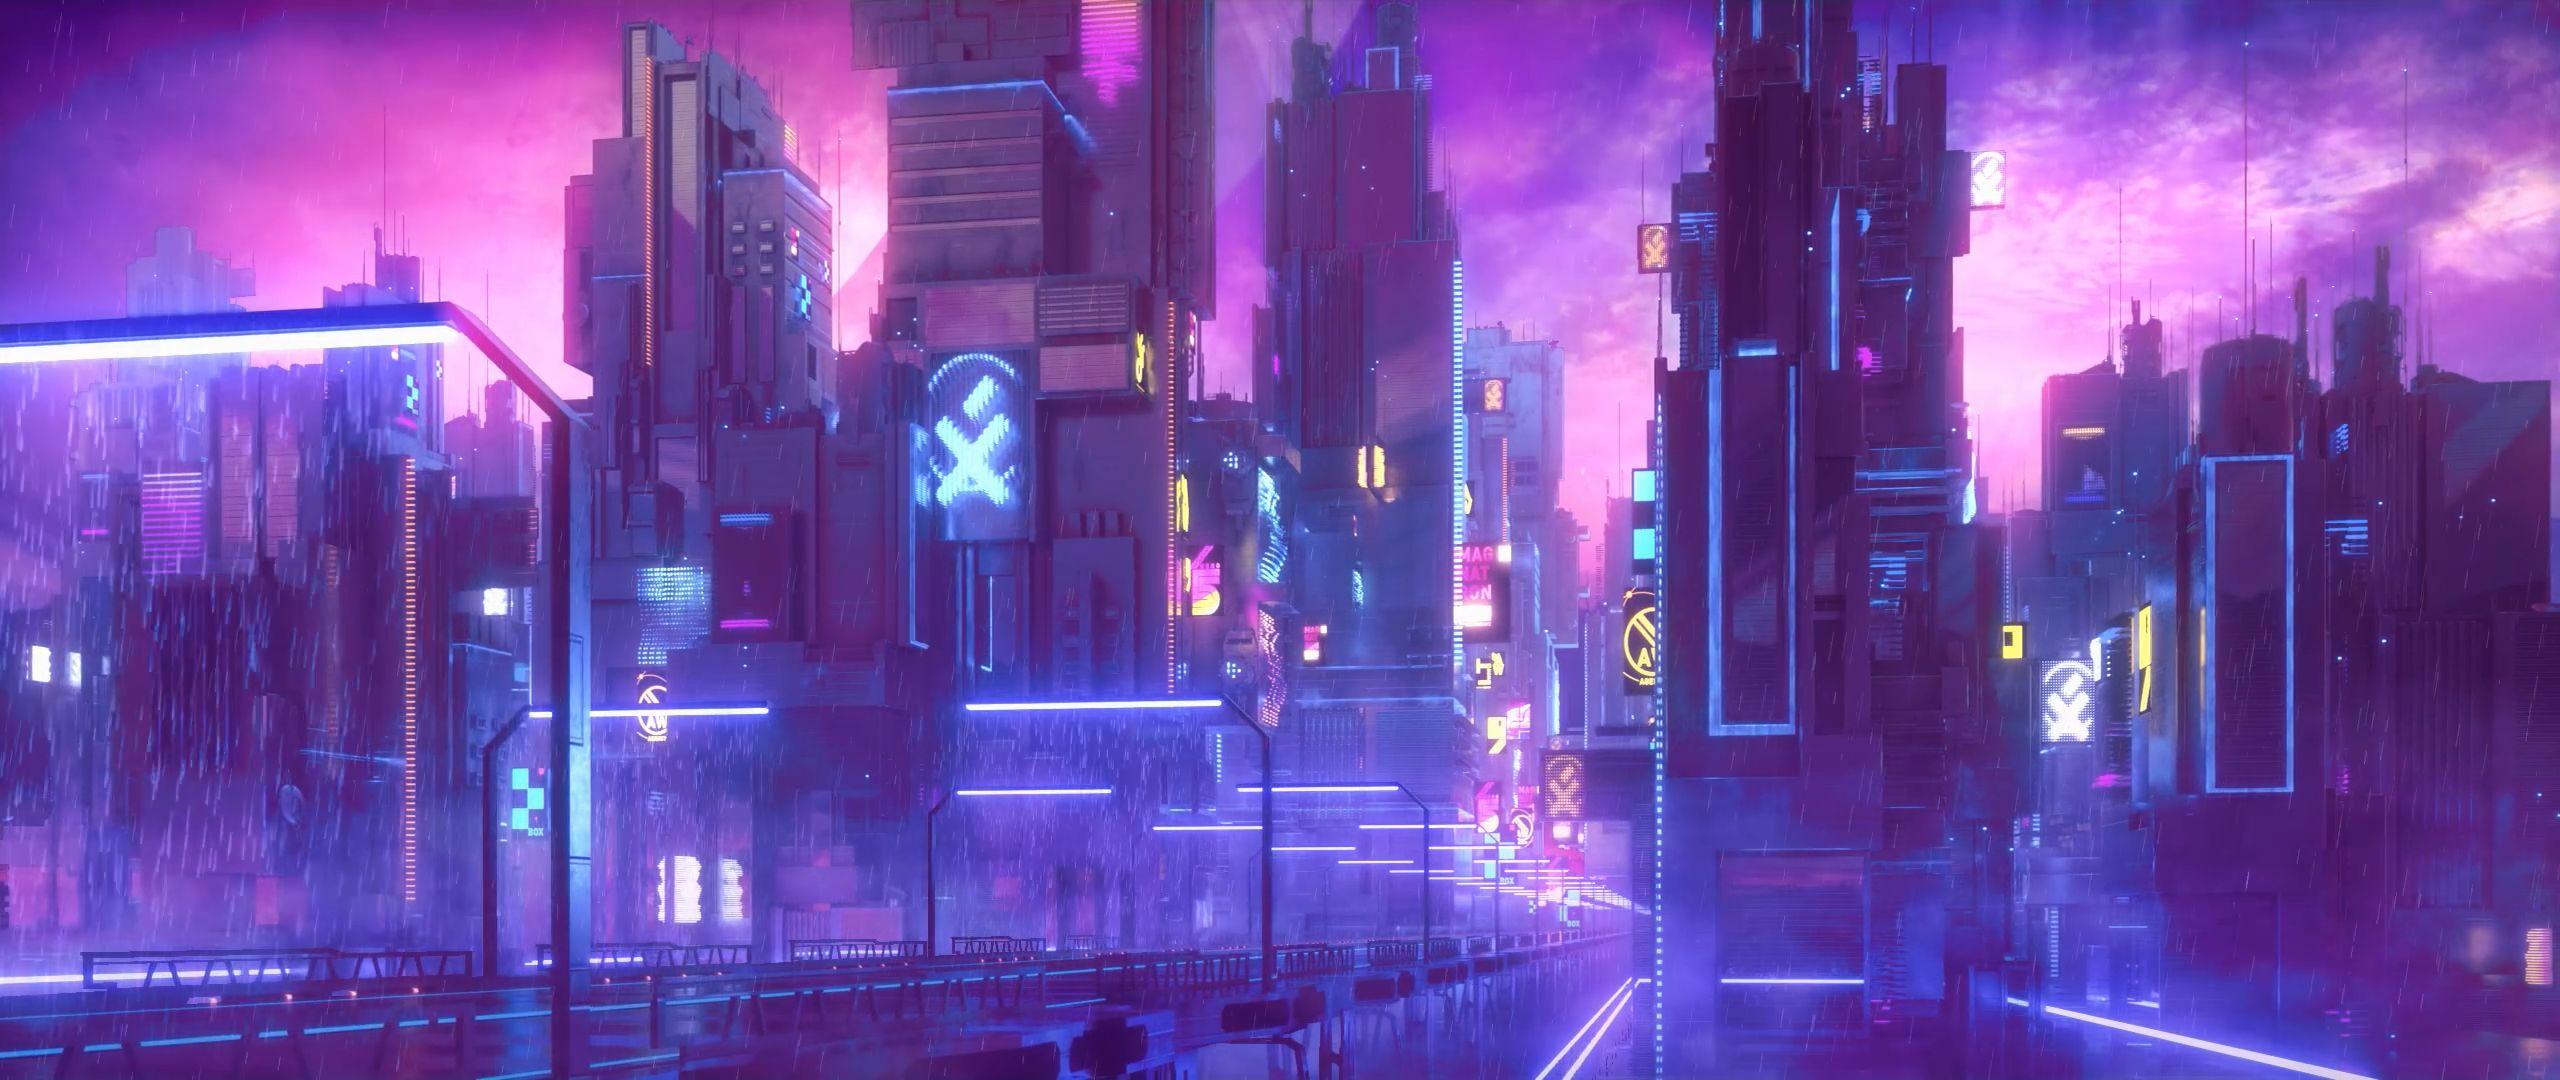 General 2560x1080 cyberpunk neon futuristic city purple neon lights artwork science fiction